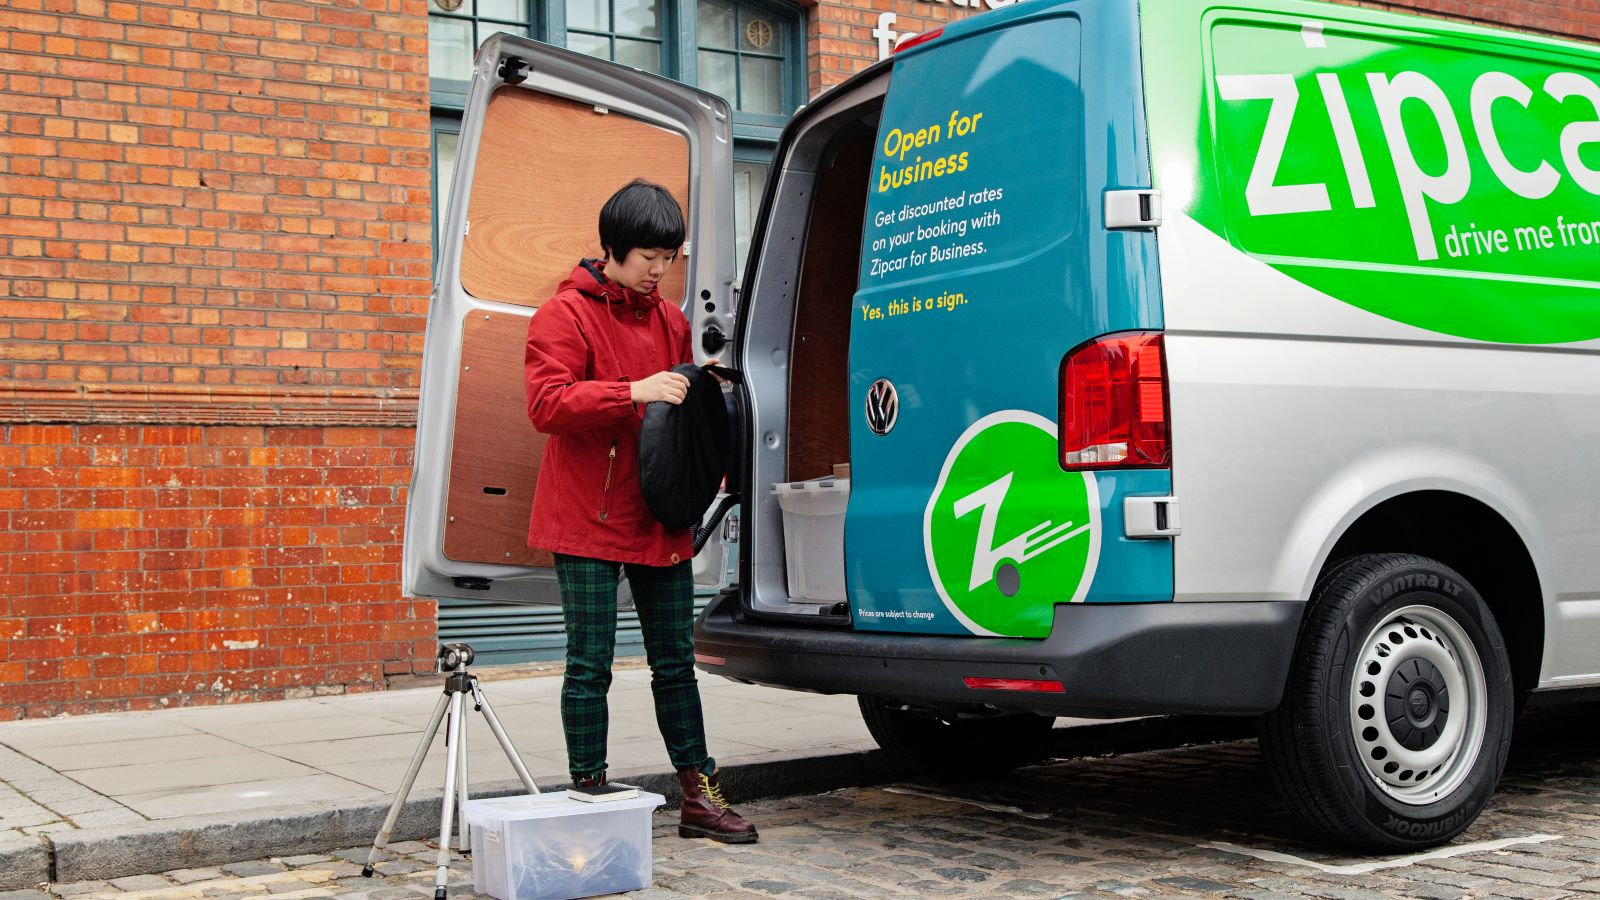 woman using a Zipcar van for a photo shoot. Loading a tripod into a van